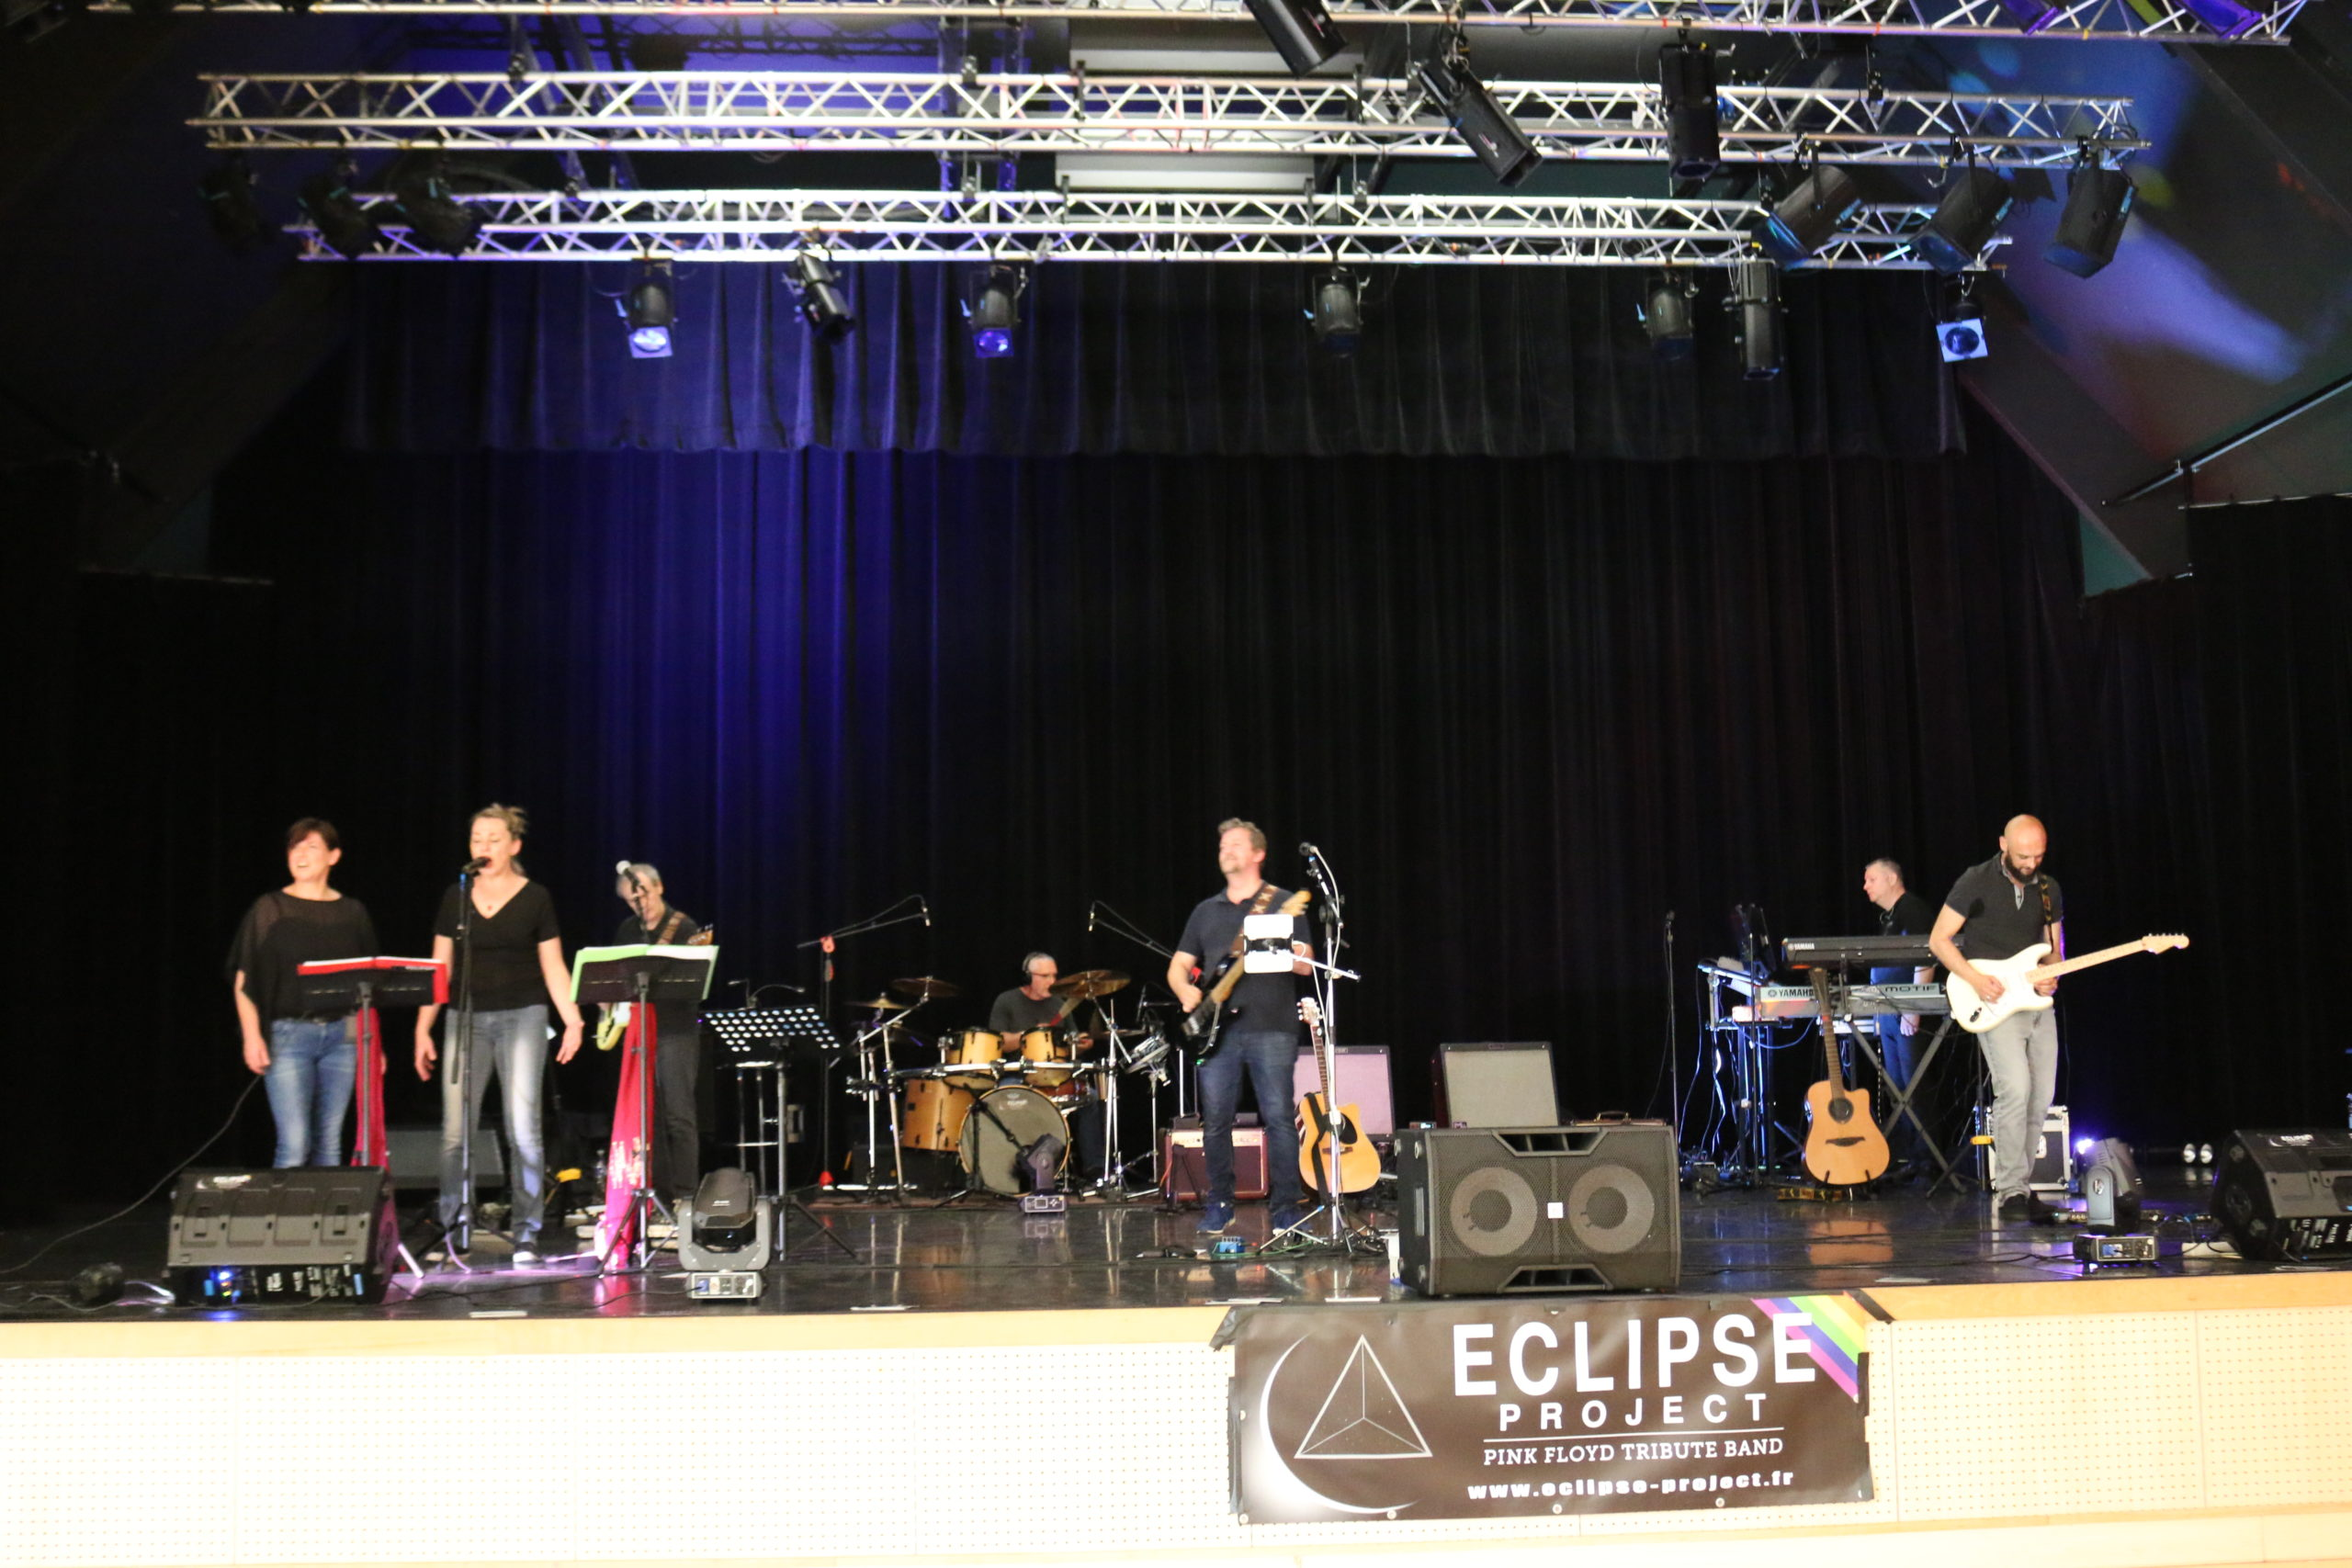 Eclipse-Project Live